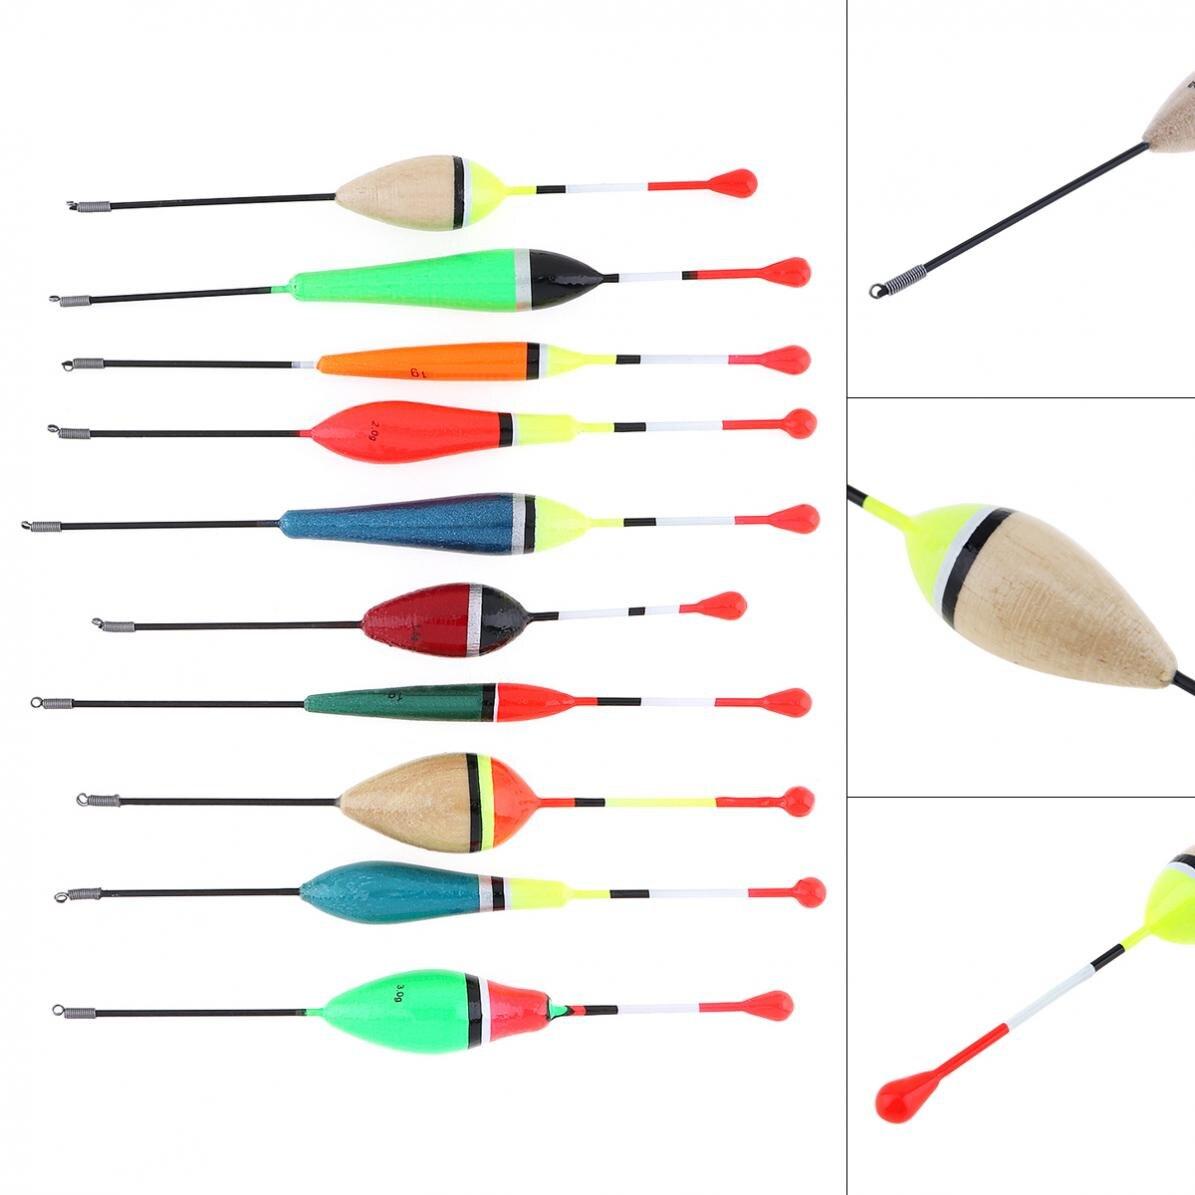 10pcs/lot Mixed Size Colorful Fishing Float Balsa Bobber 14.8cm - 17.1cm 1g - 4g for Rock Lakes Reservoir Fishing